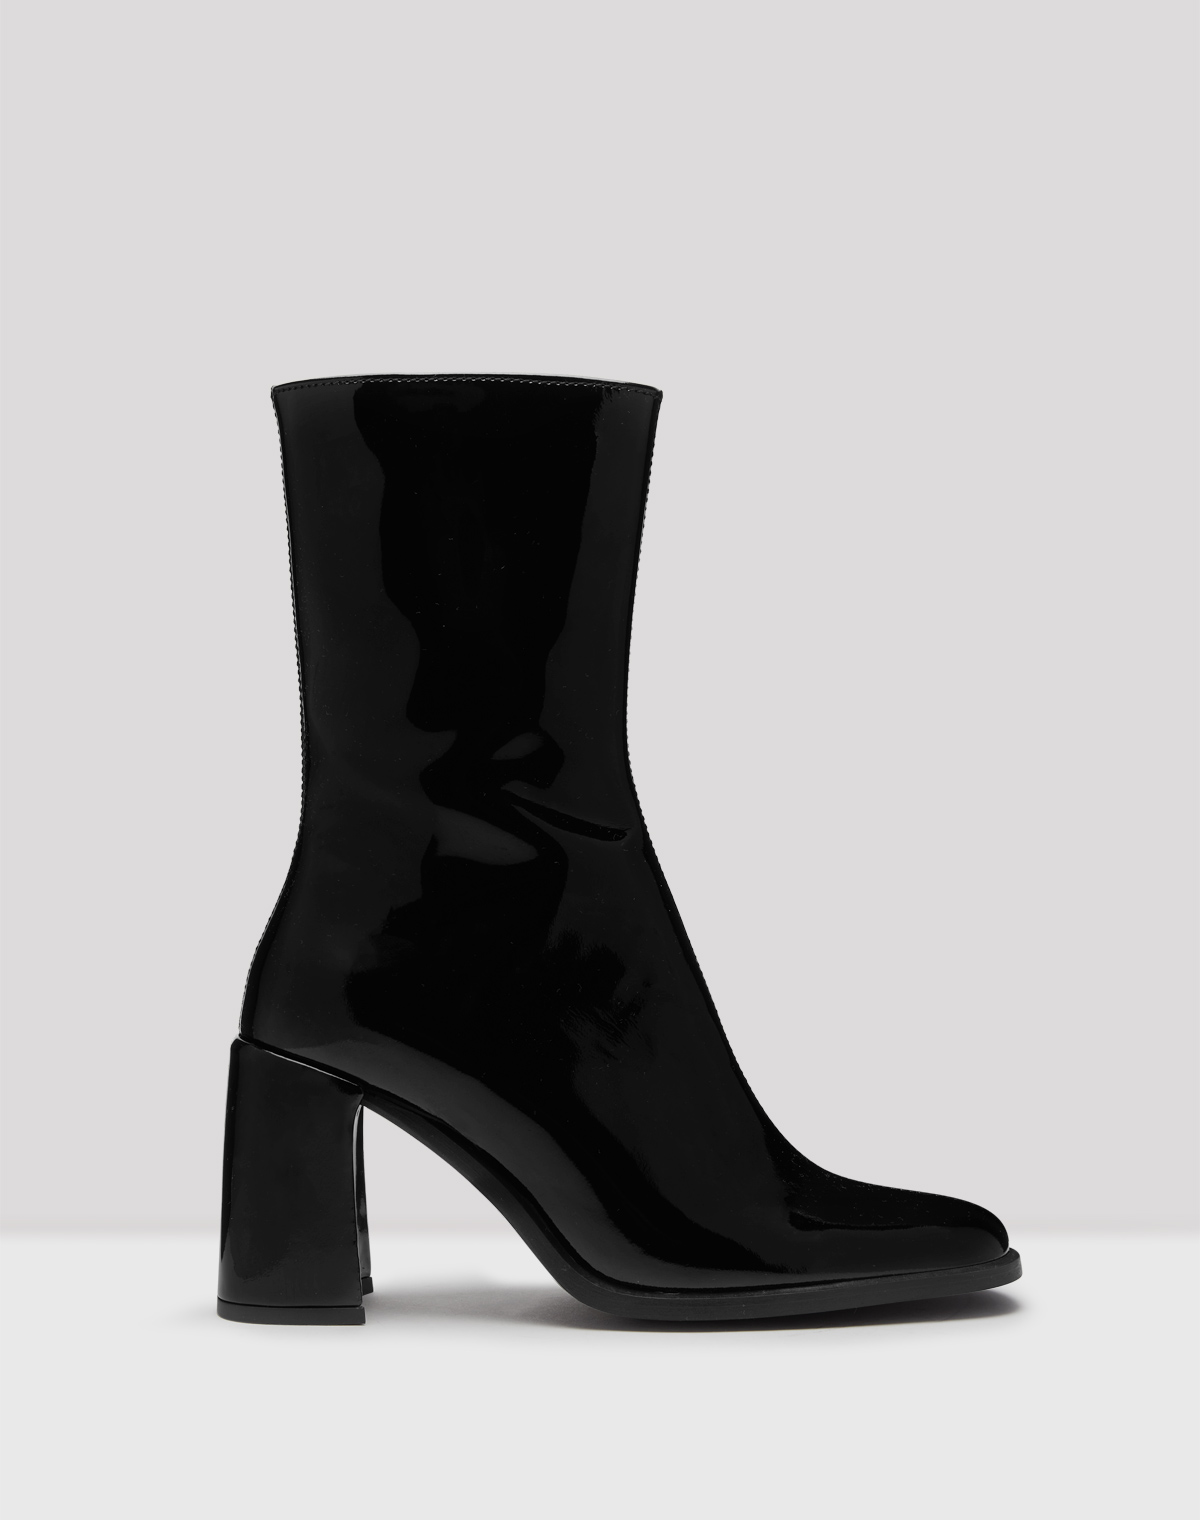 Asta Black Patent Leather Boots // E8